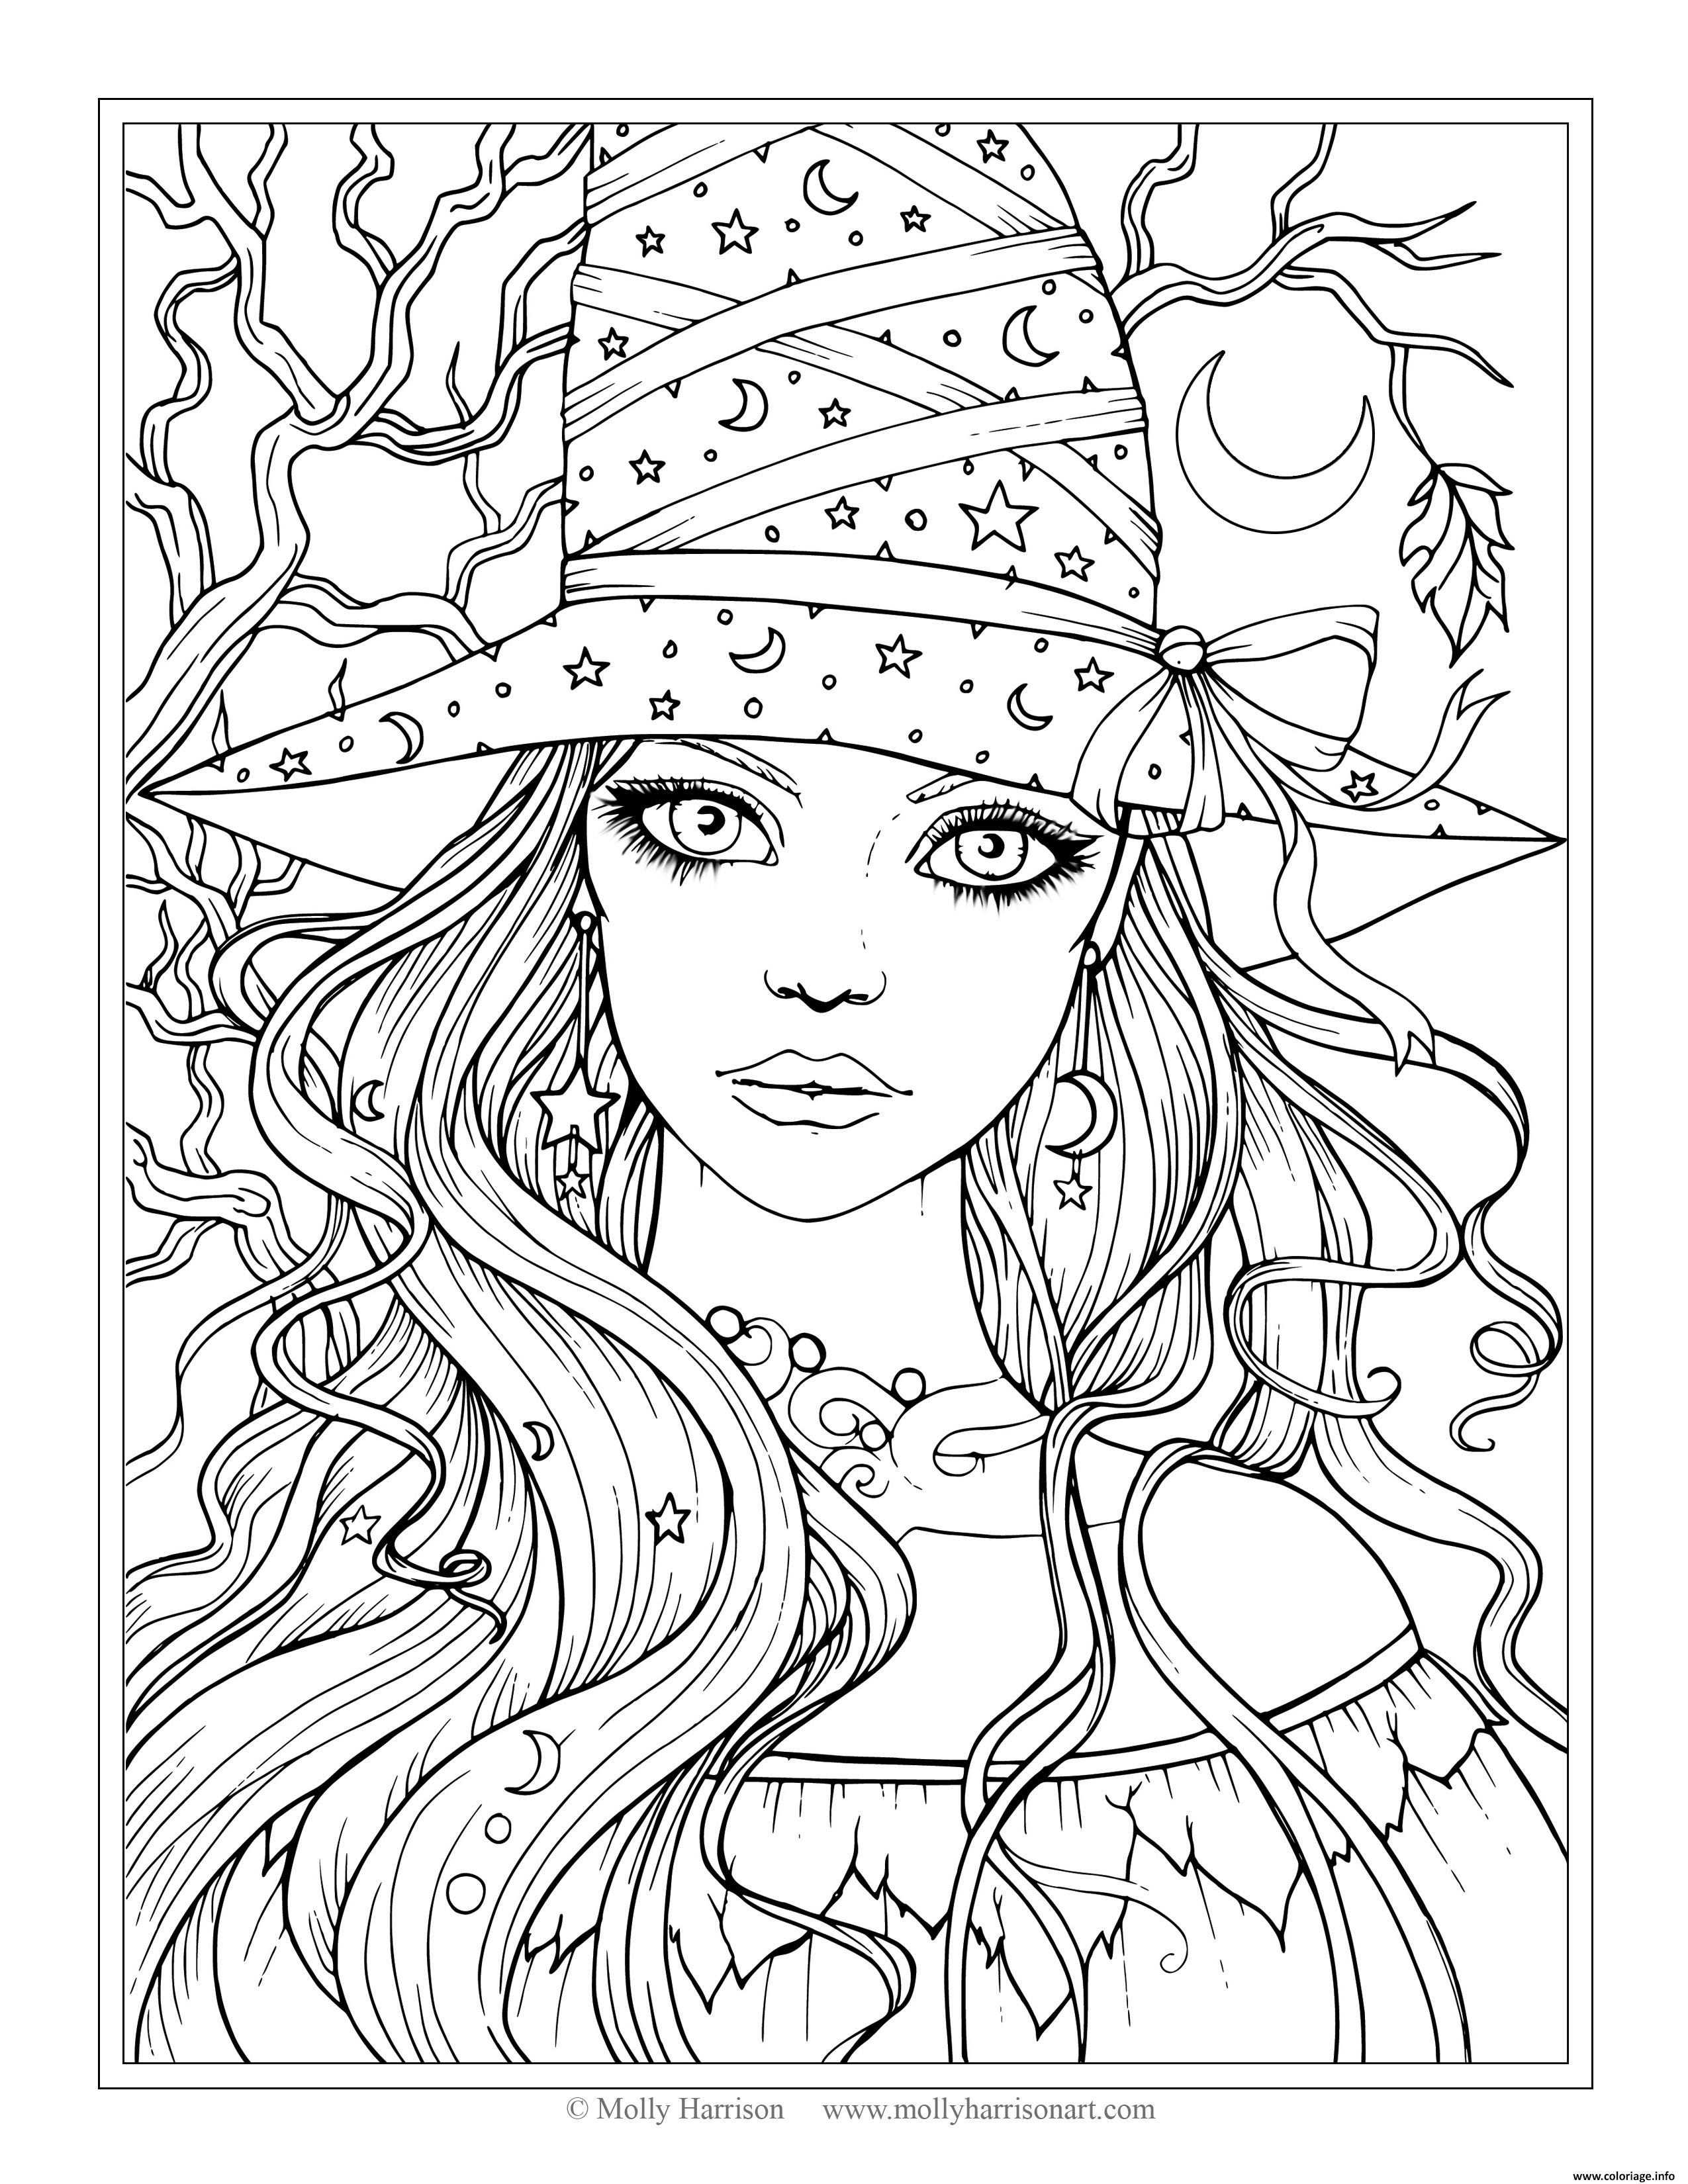 coloriage halloween adulte sorciere dessin imprimer - Coloriage Imprimer Adulte